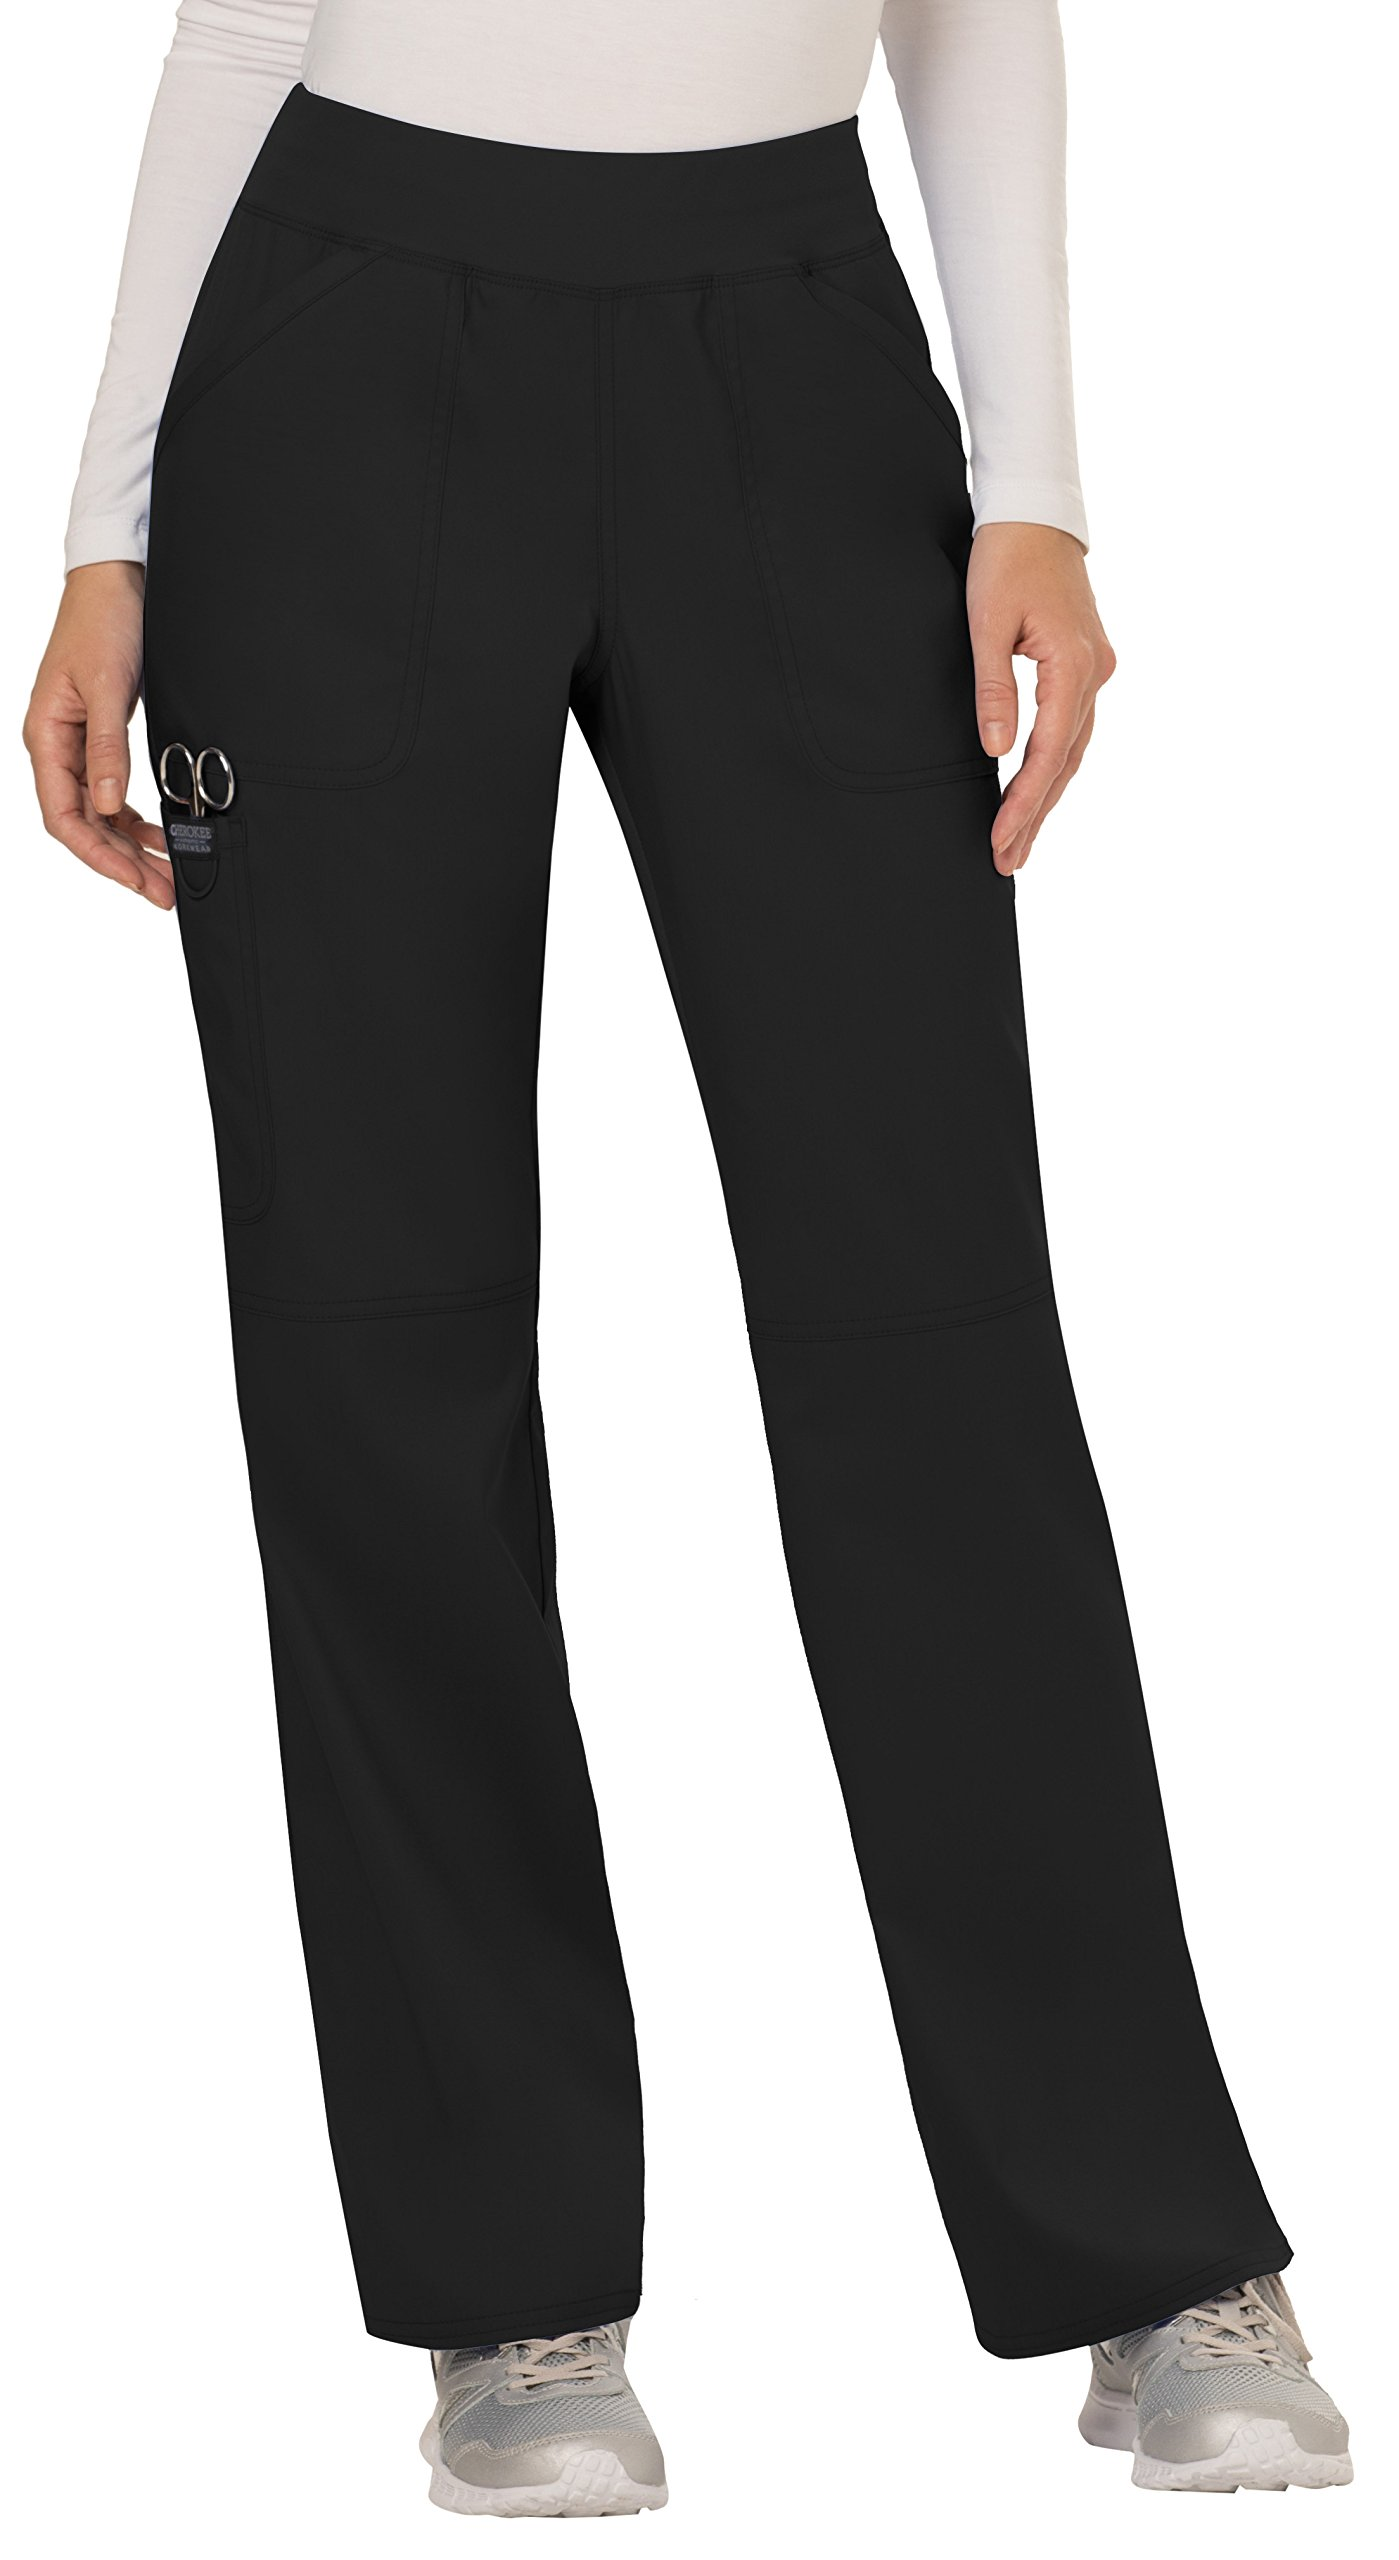 WW Revolution by Cherokee Women's Mid Rise Straight Leg Pull-on Pant, Black, M